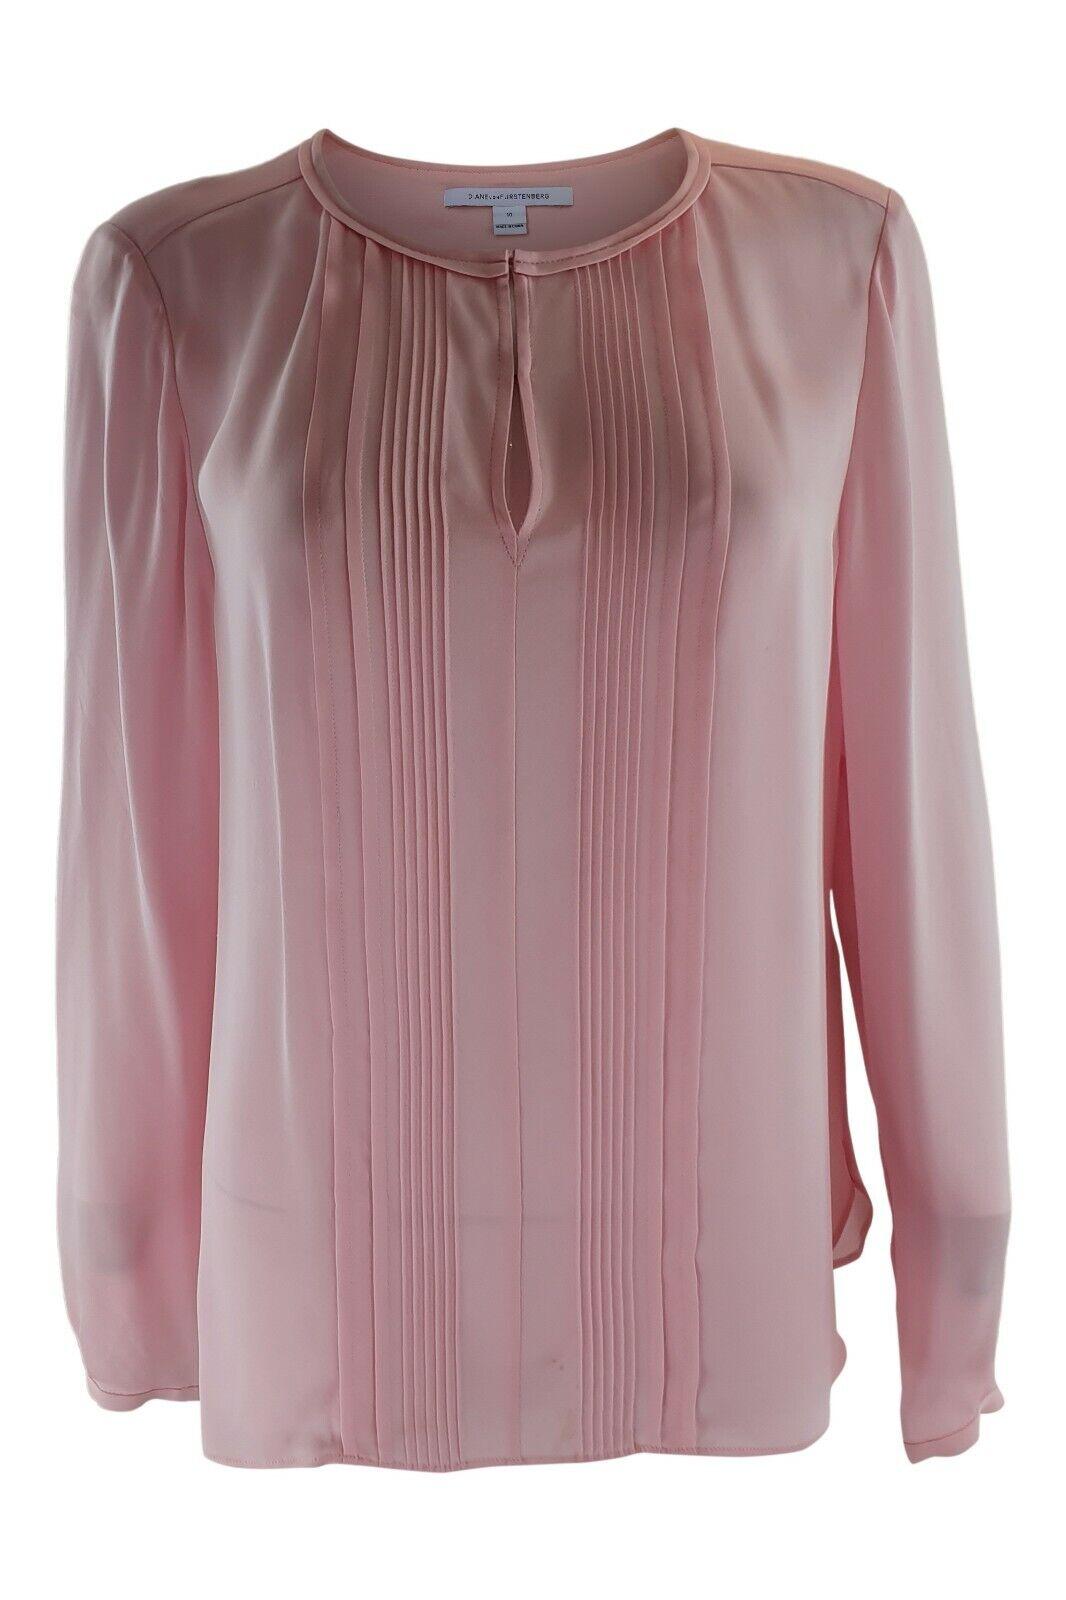 DIANE VON FURSTENBERG Woherren 100% Silk Long Sleeve Blouse, Rosa (10)